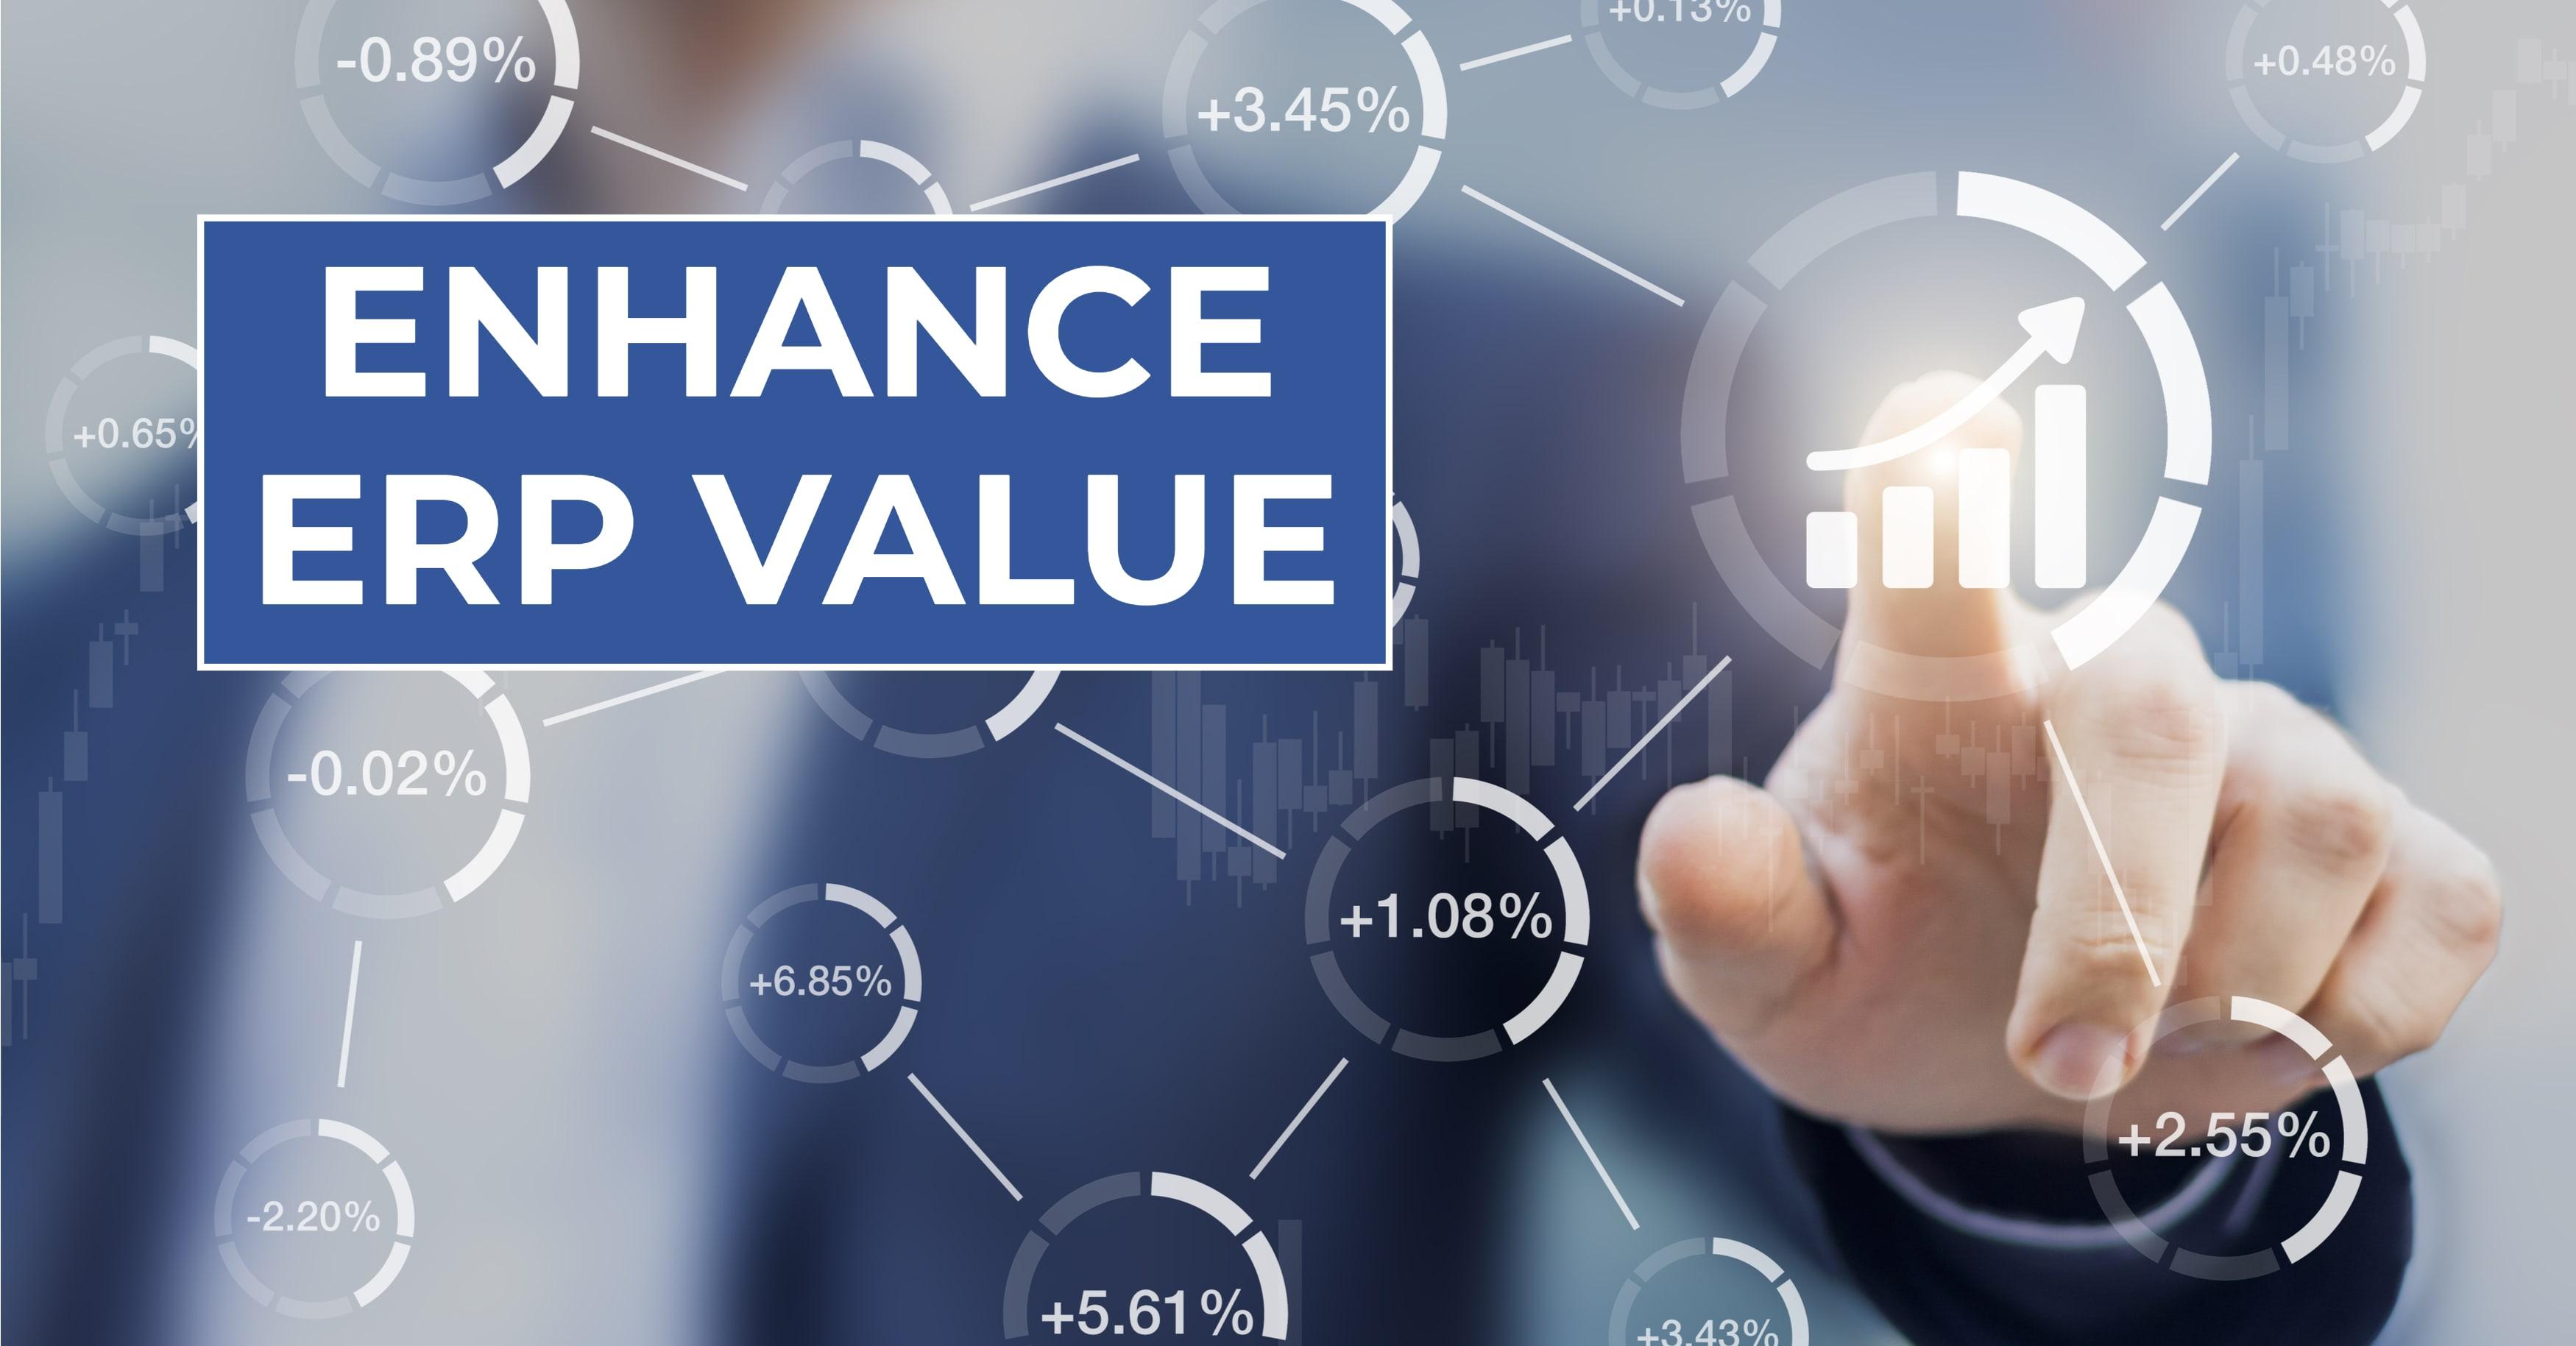 Enhance ERP Value